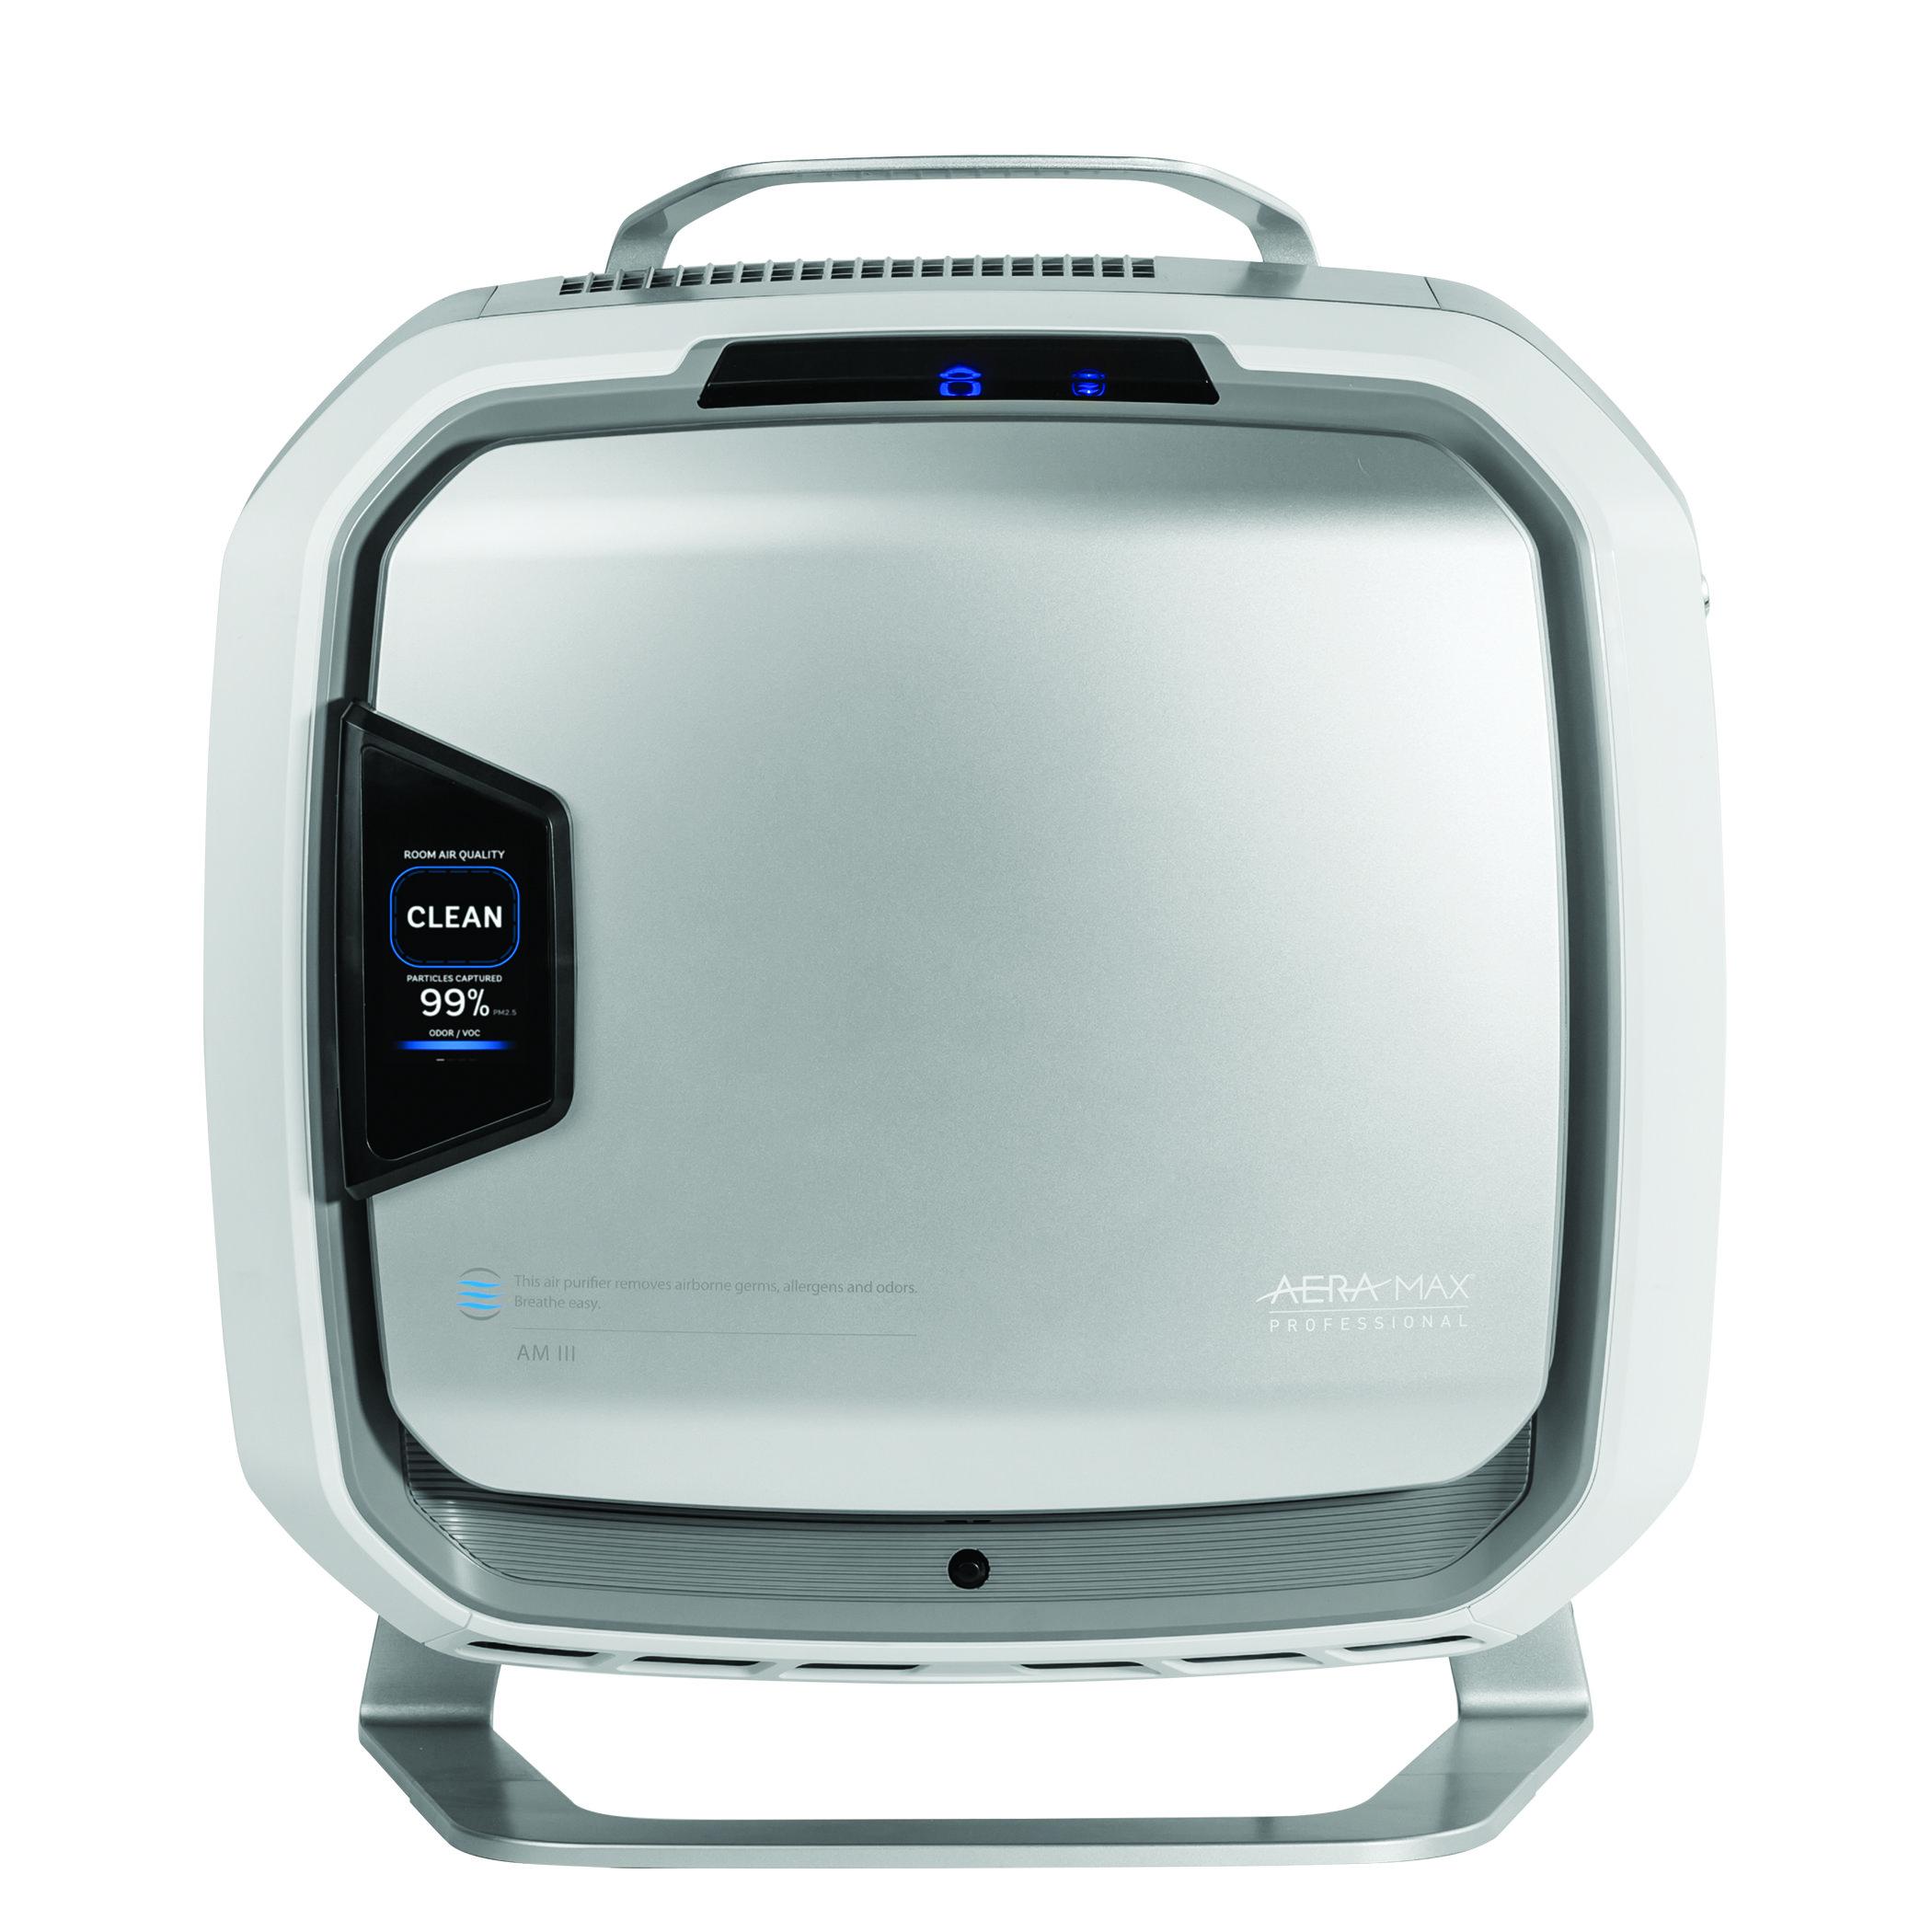 AeraMax™ Professional AM IIIS PureView Portable čistilec zraka